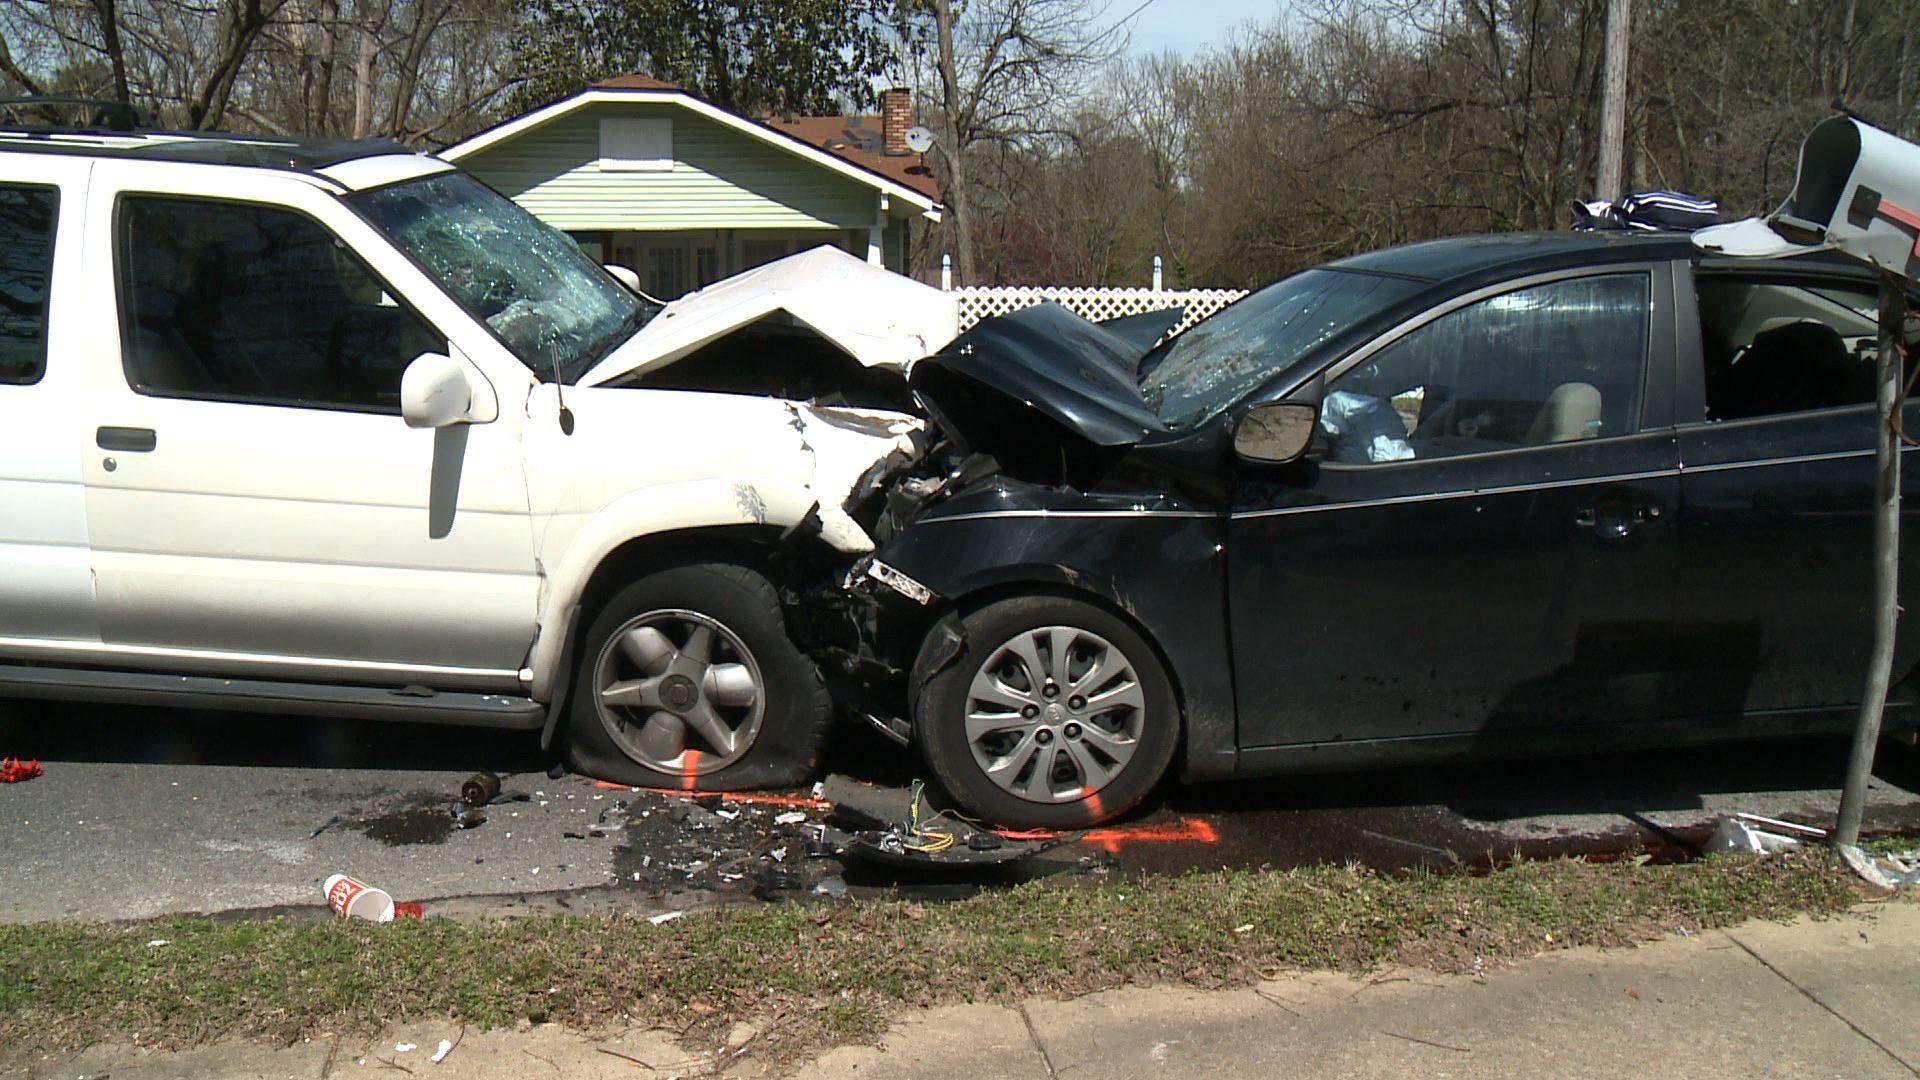 Update Victims Identified In Albertville Crash Whnt Com